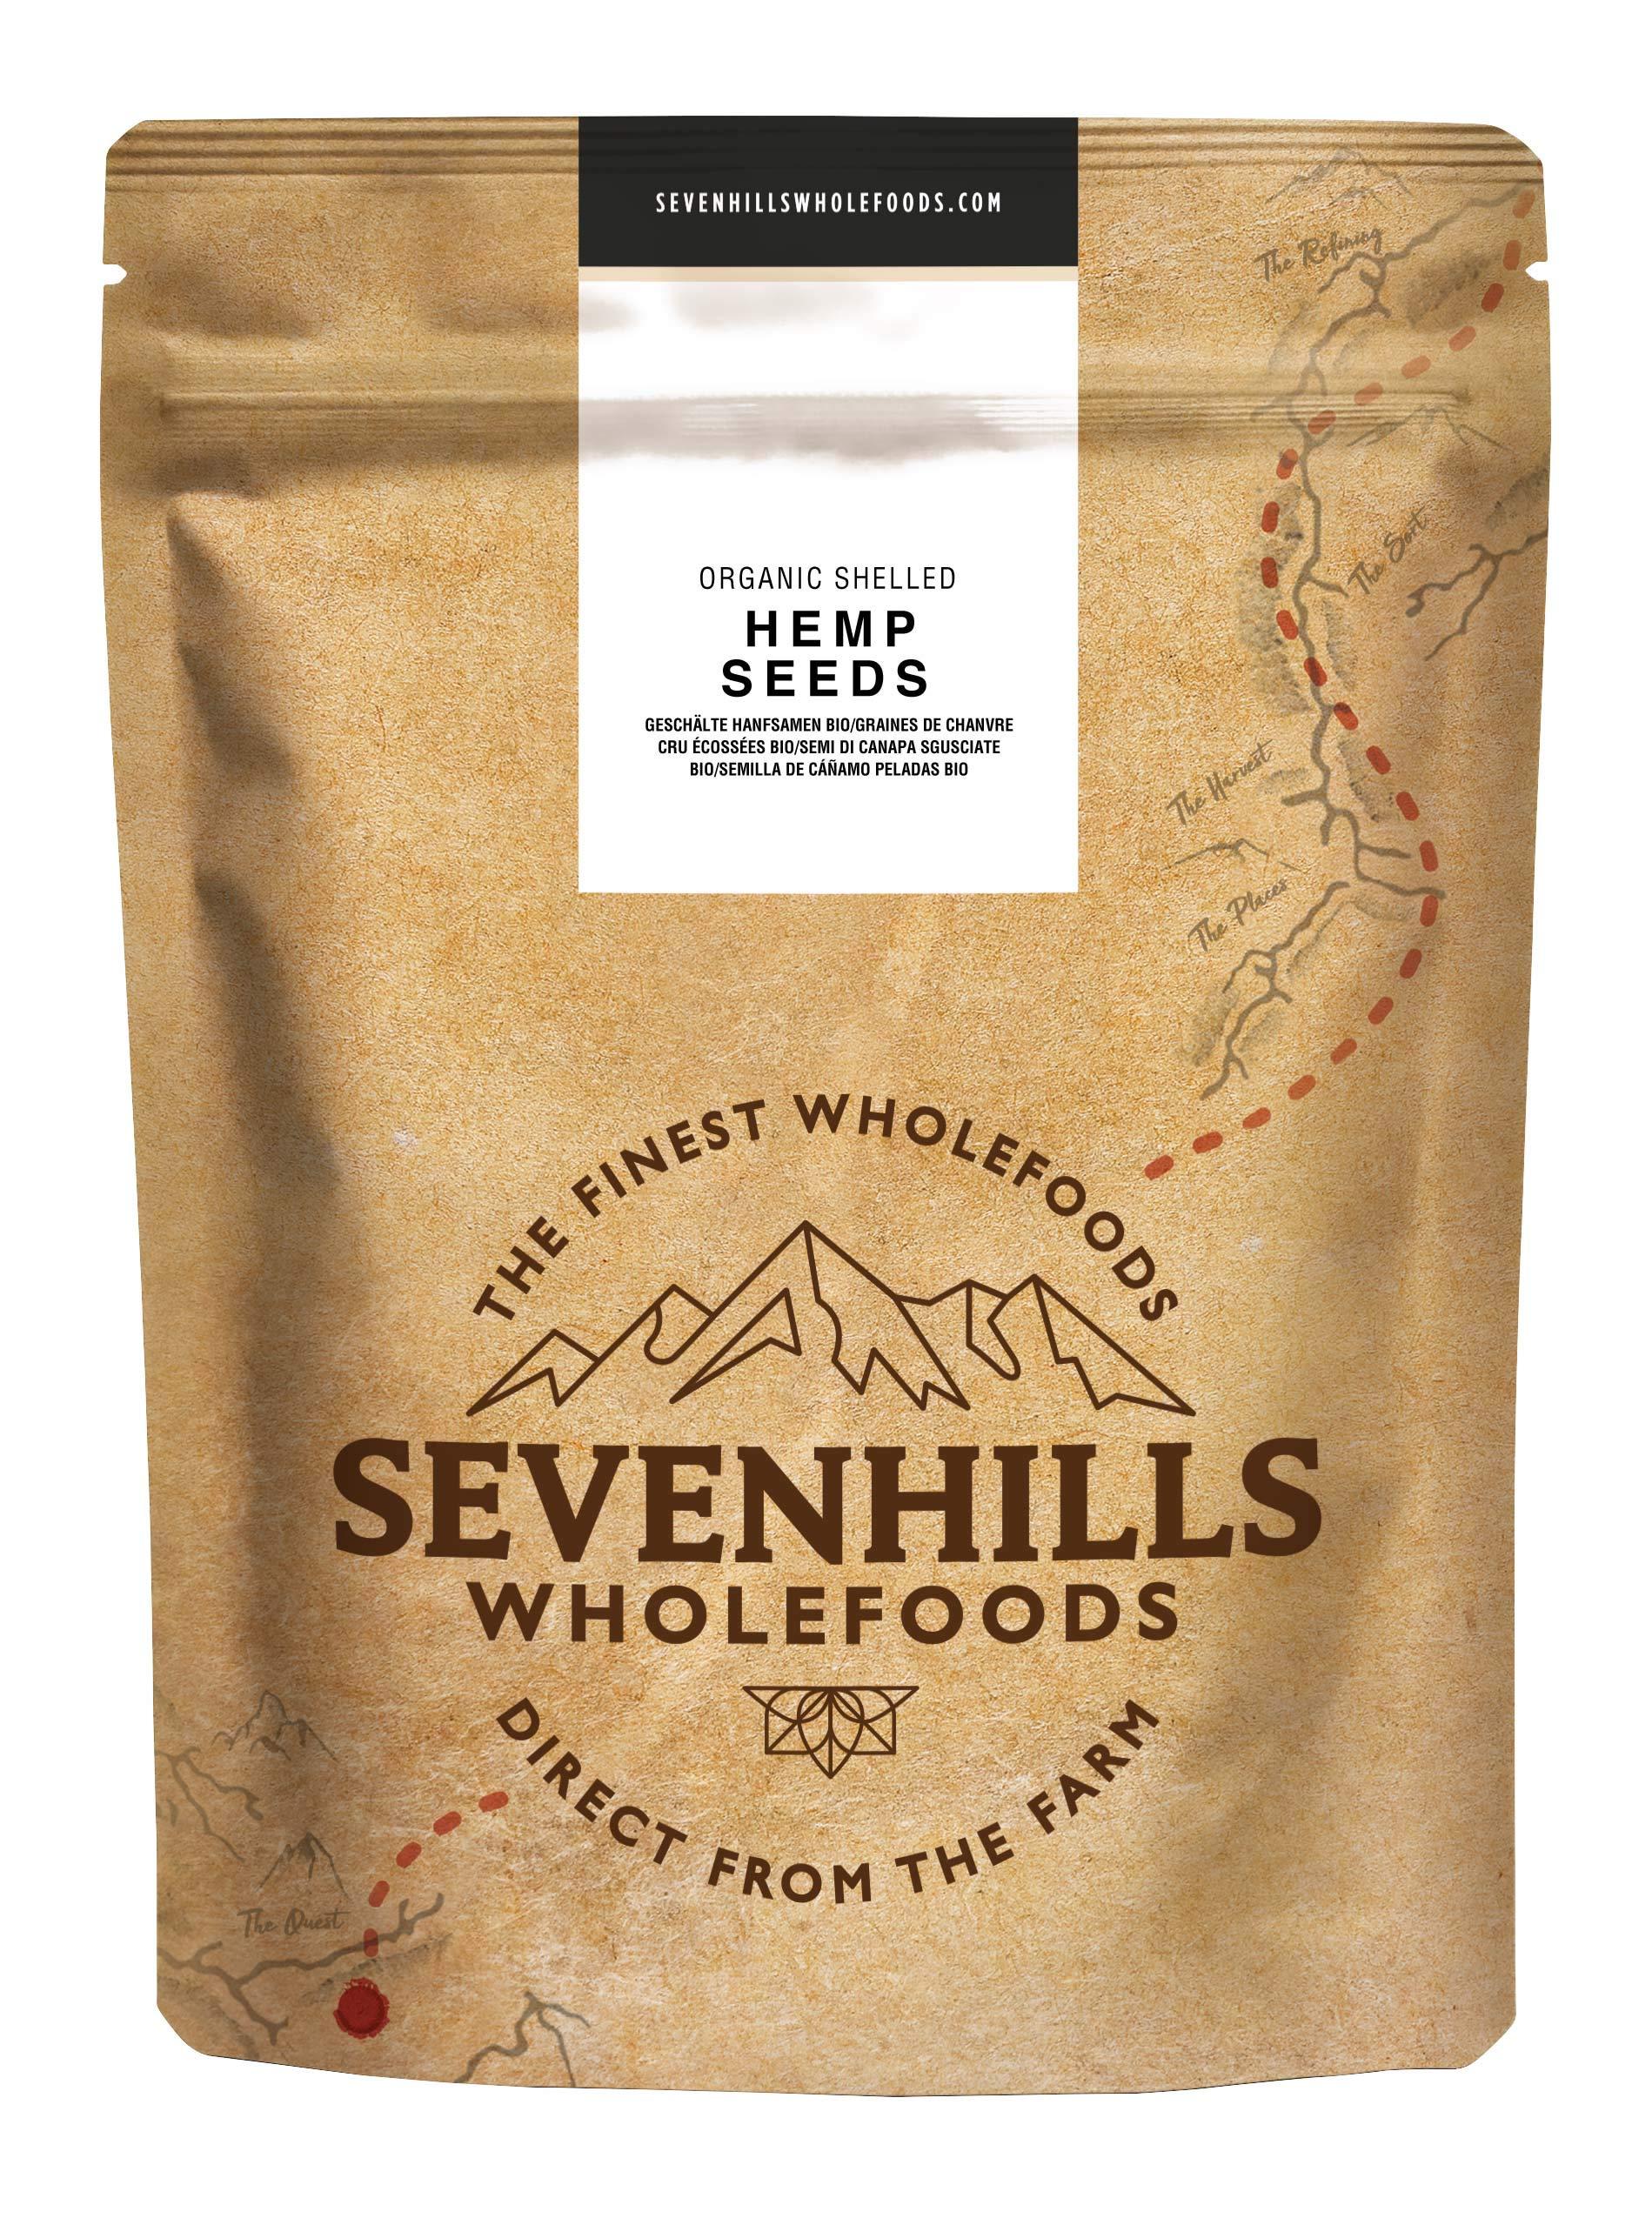 Sevenhills Wholefoods Organic Shelled Hemp Seeds 1kg 1